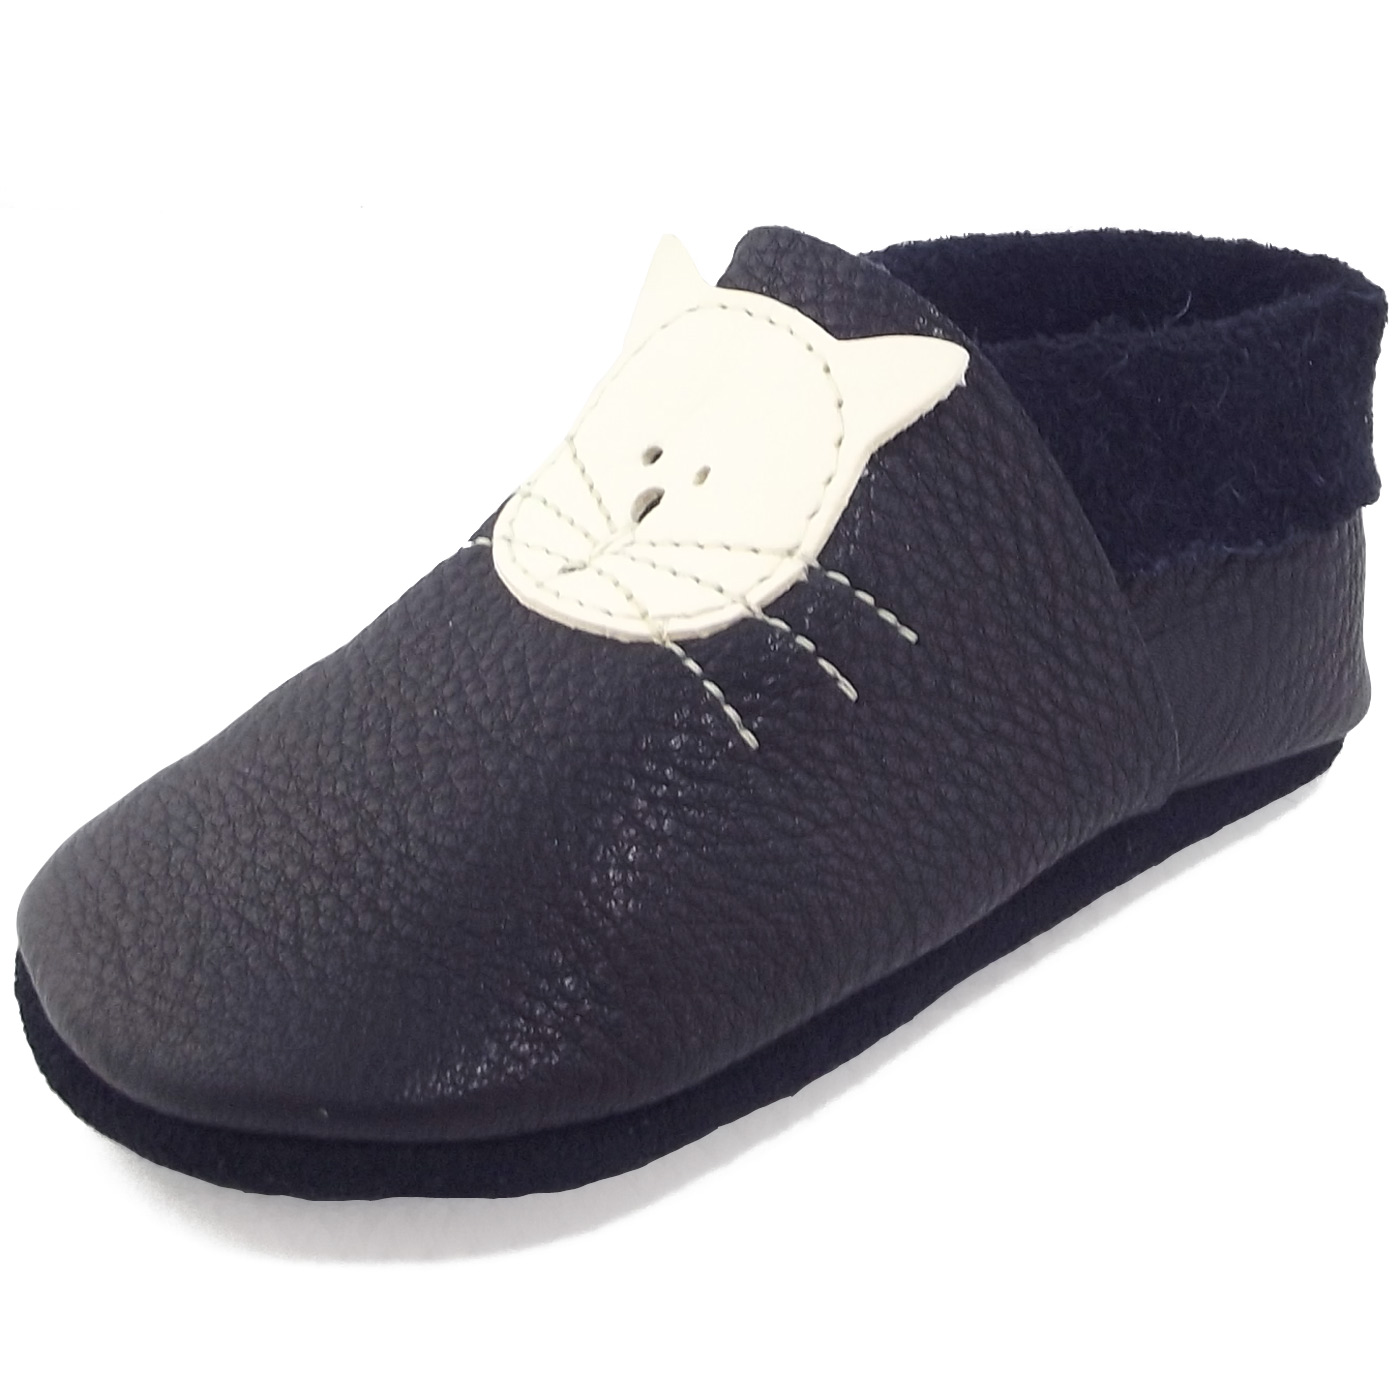 Po o Kitty Toddler Crawling Shoes dark blue enzian